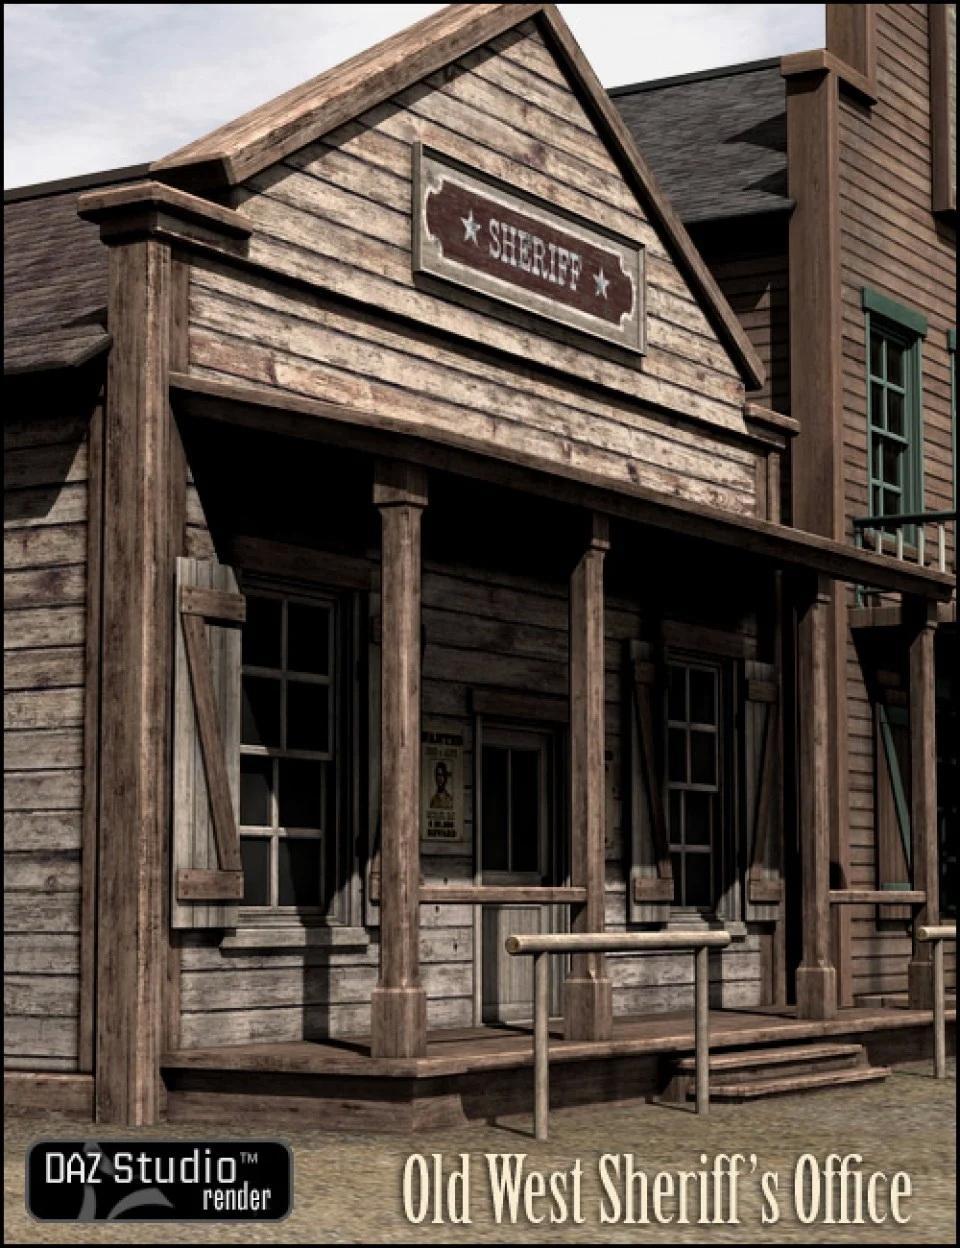 Old West Sheriffs Office